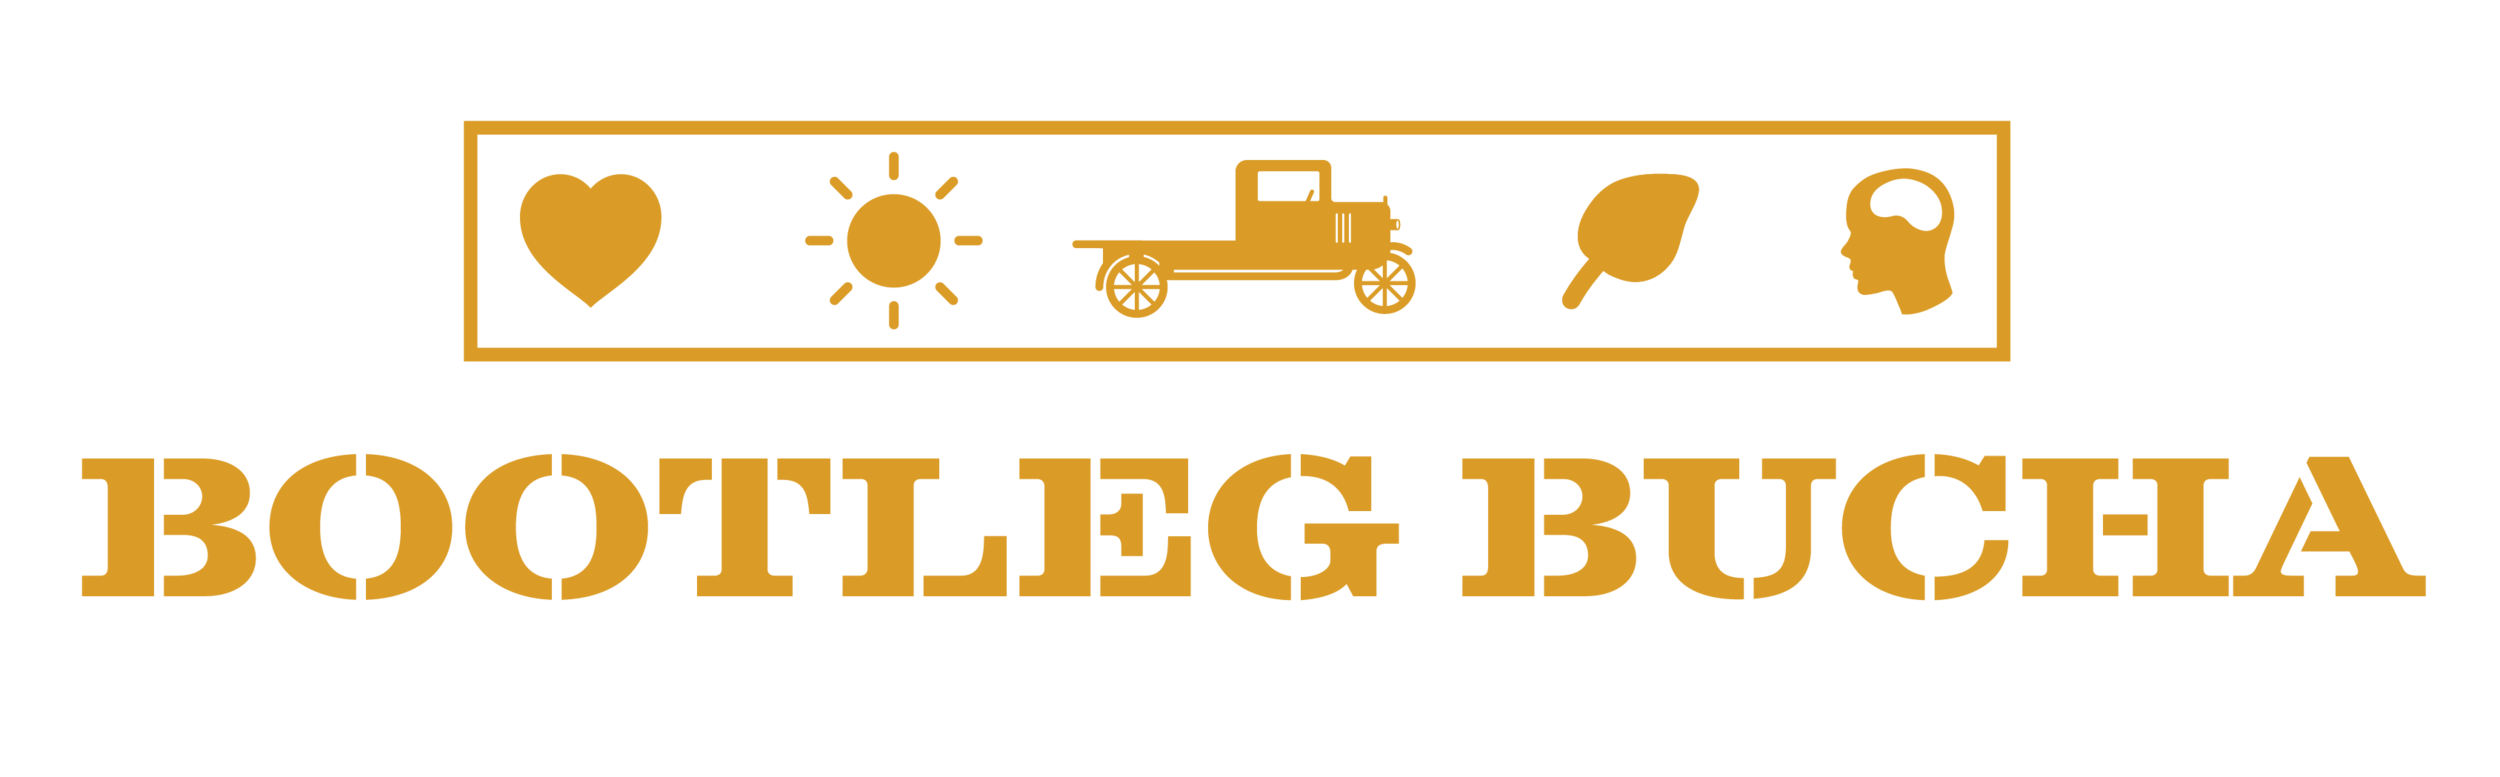 Bootleg_Logo_Yellow.png